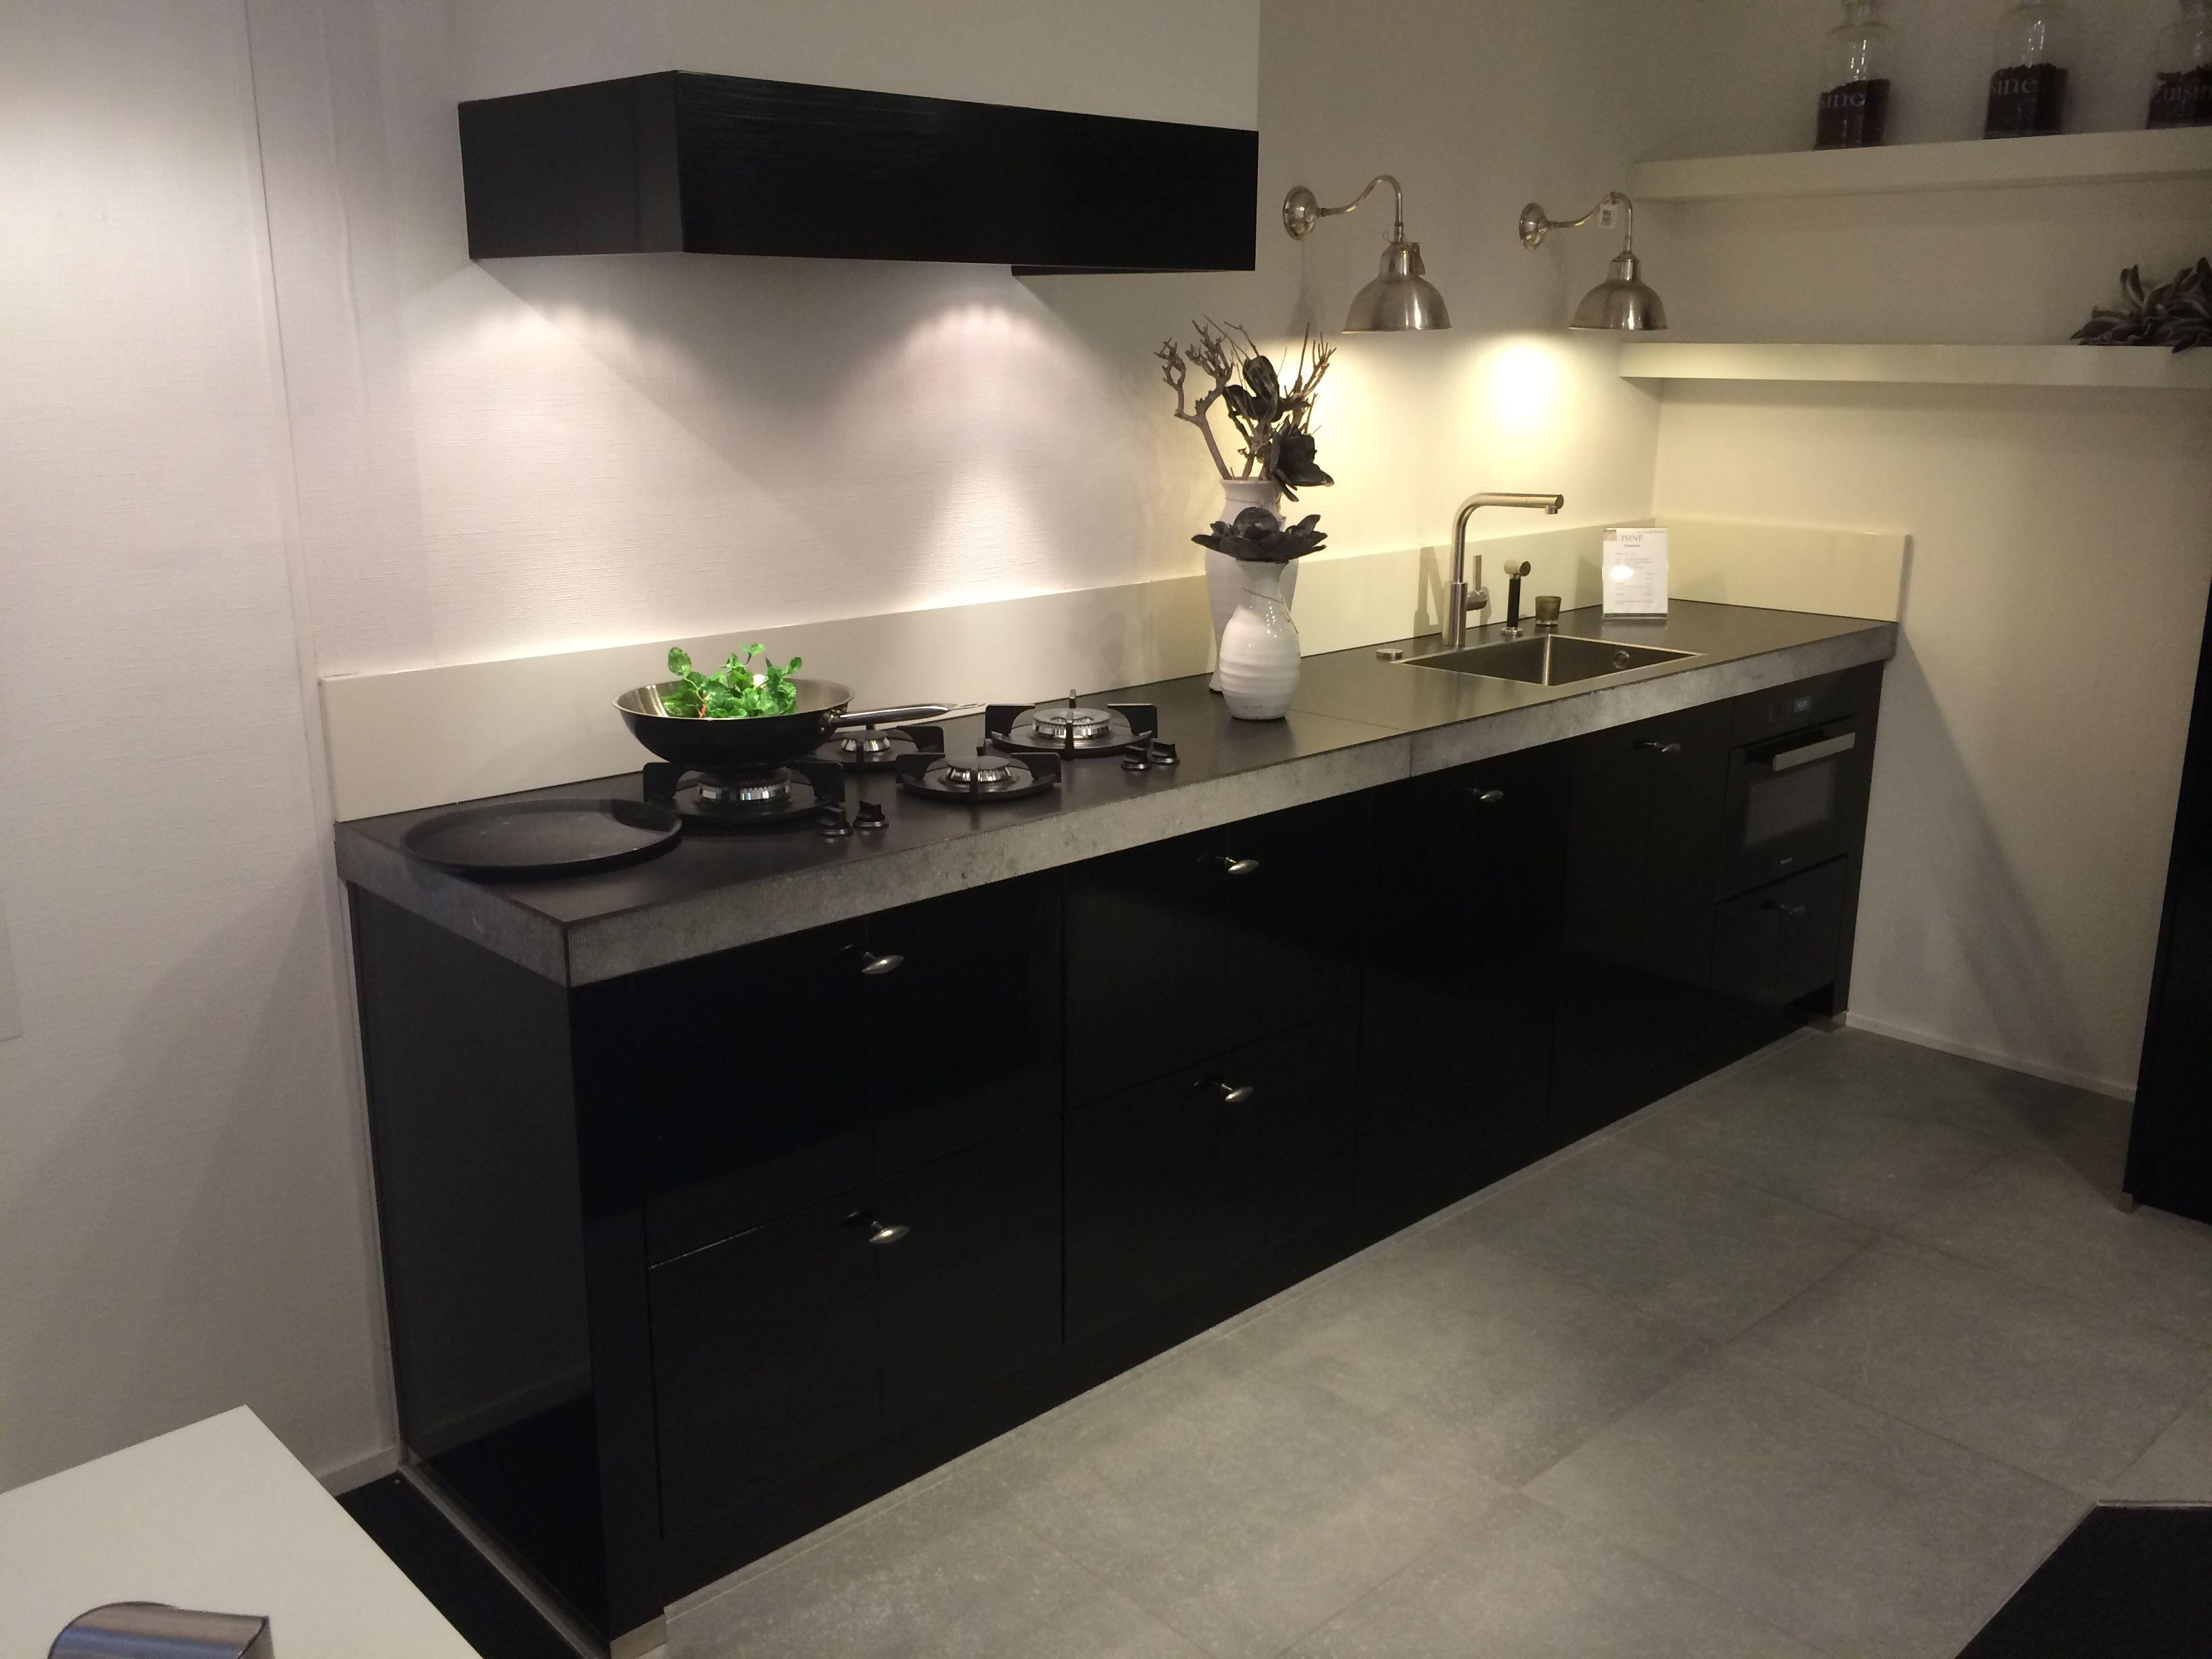 Sijben Roermond Keukens : This showroom kitchen makes us happy via van ginkel keukens